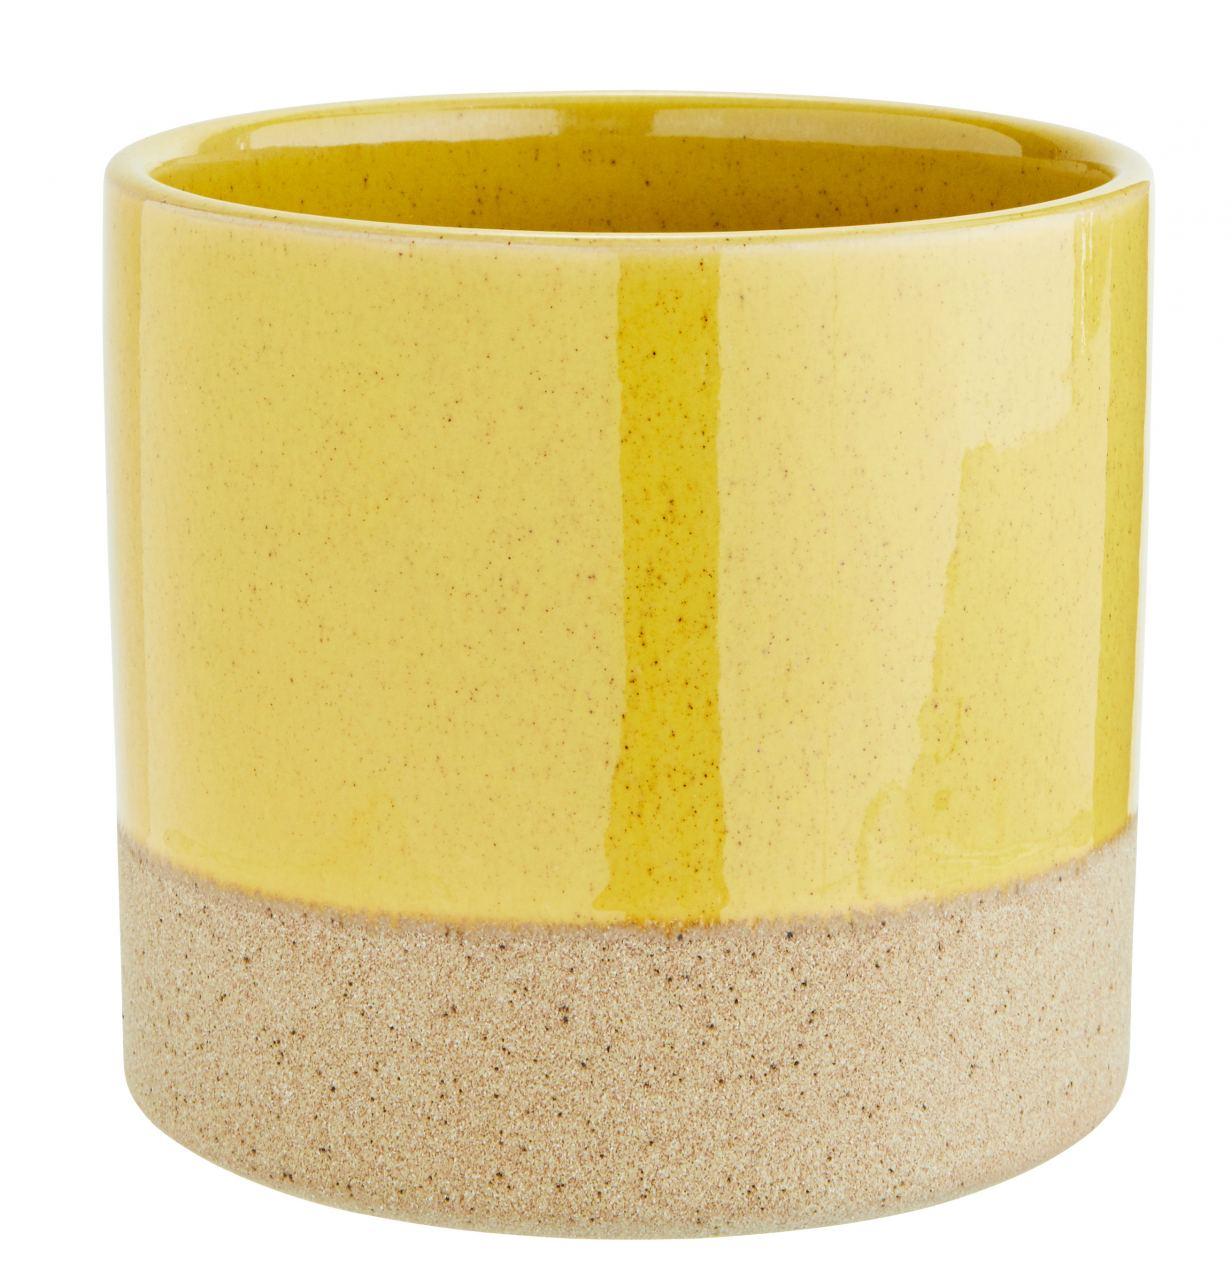 Two Tone Blumentopf Yellow Natural